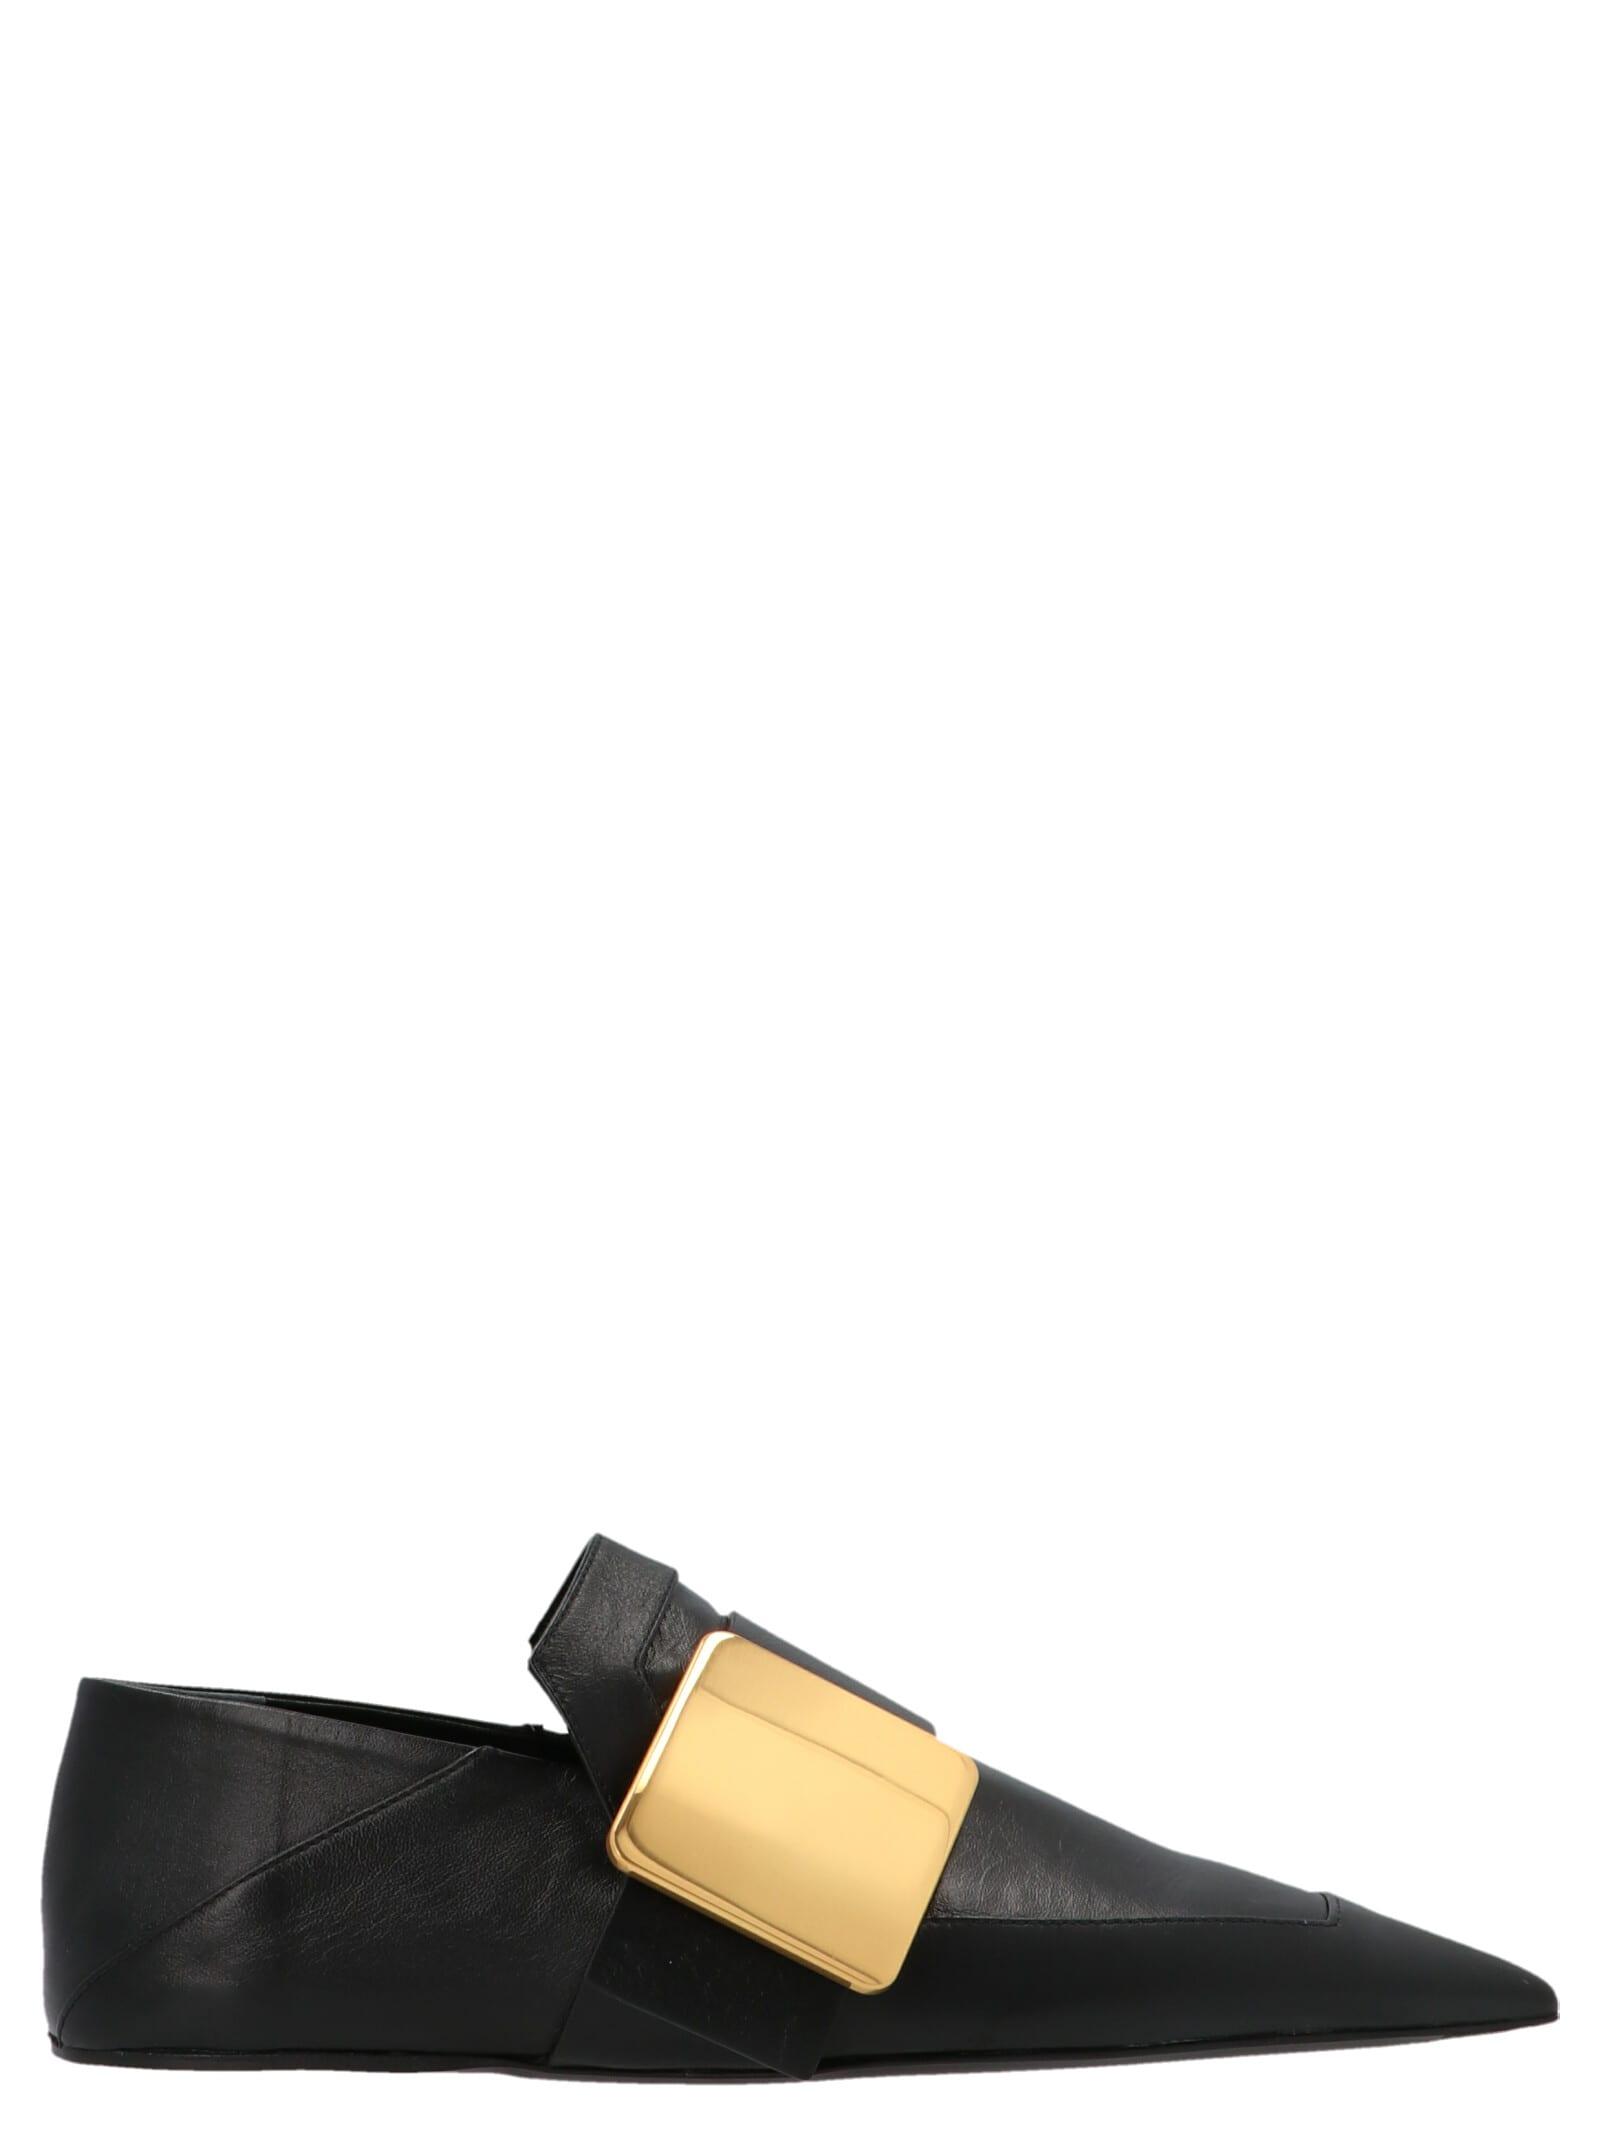 Buy Jil Sander grinch Shoes online, shop Jil Sander shoes with free shipping